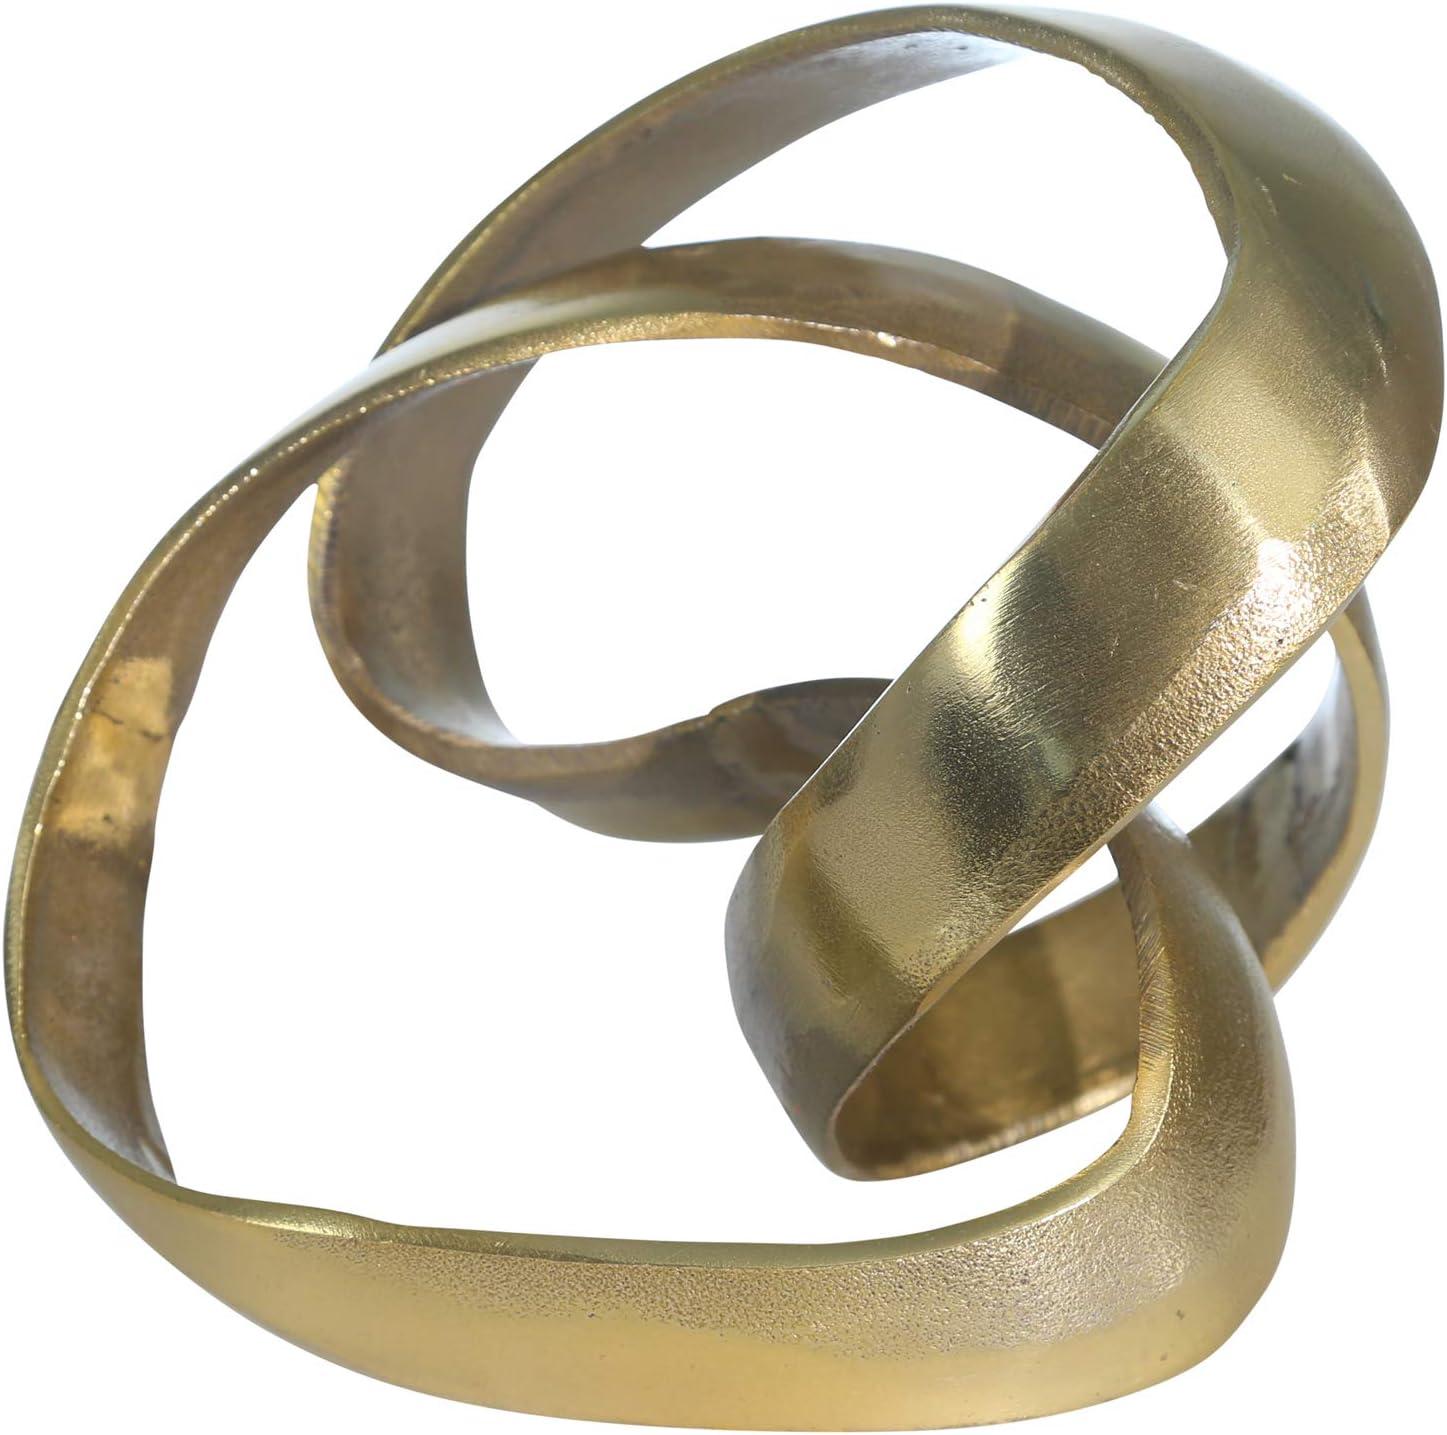 Sagebrook Home 14585-01 Aluminum Knot Sculpture, 7